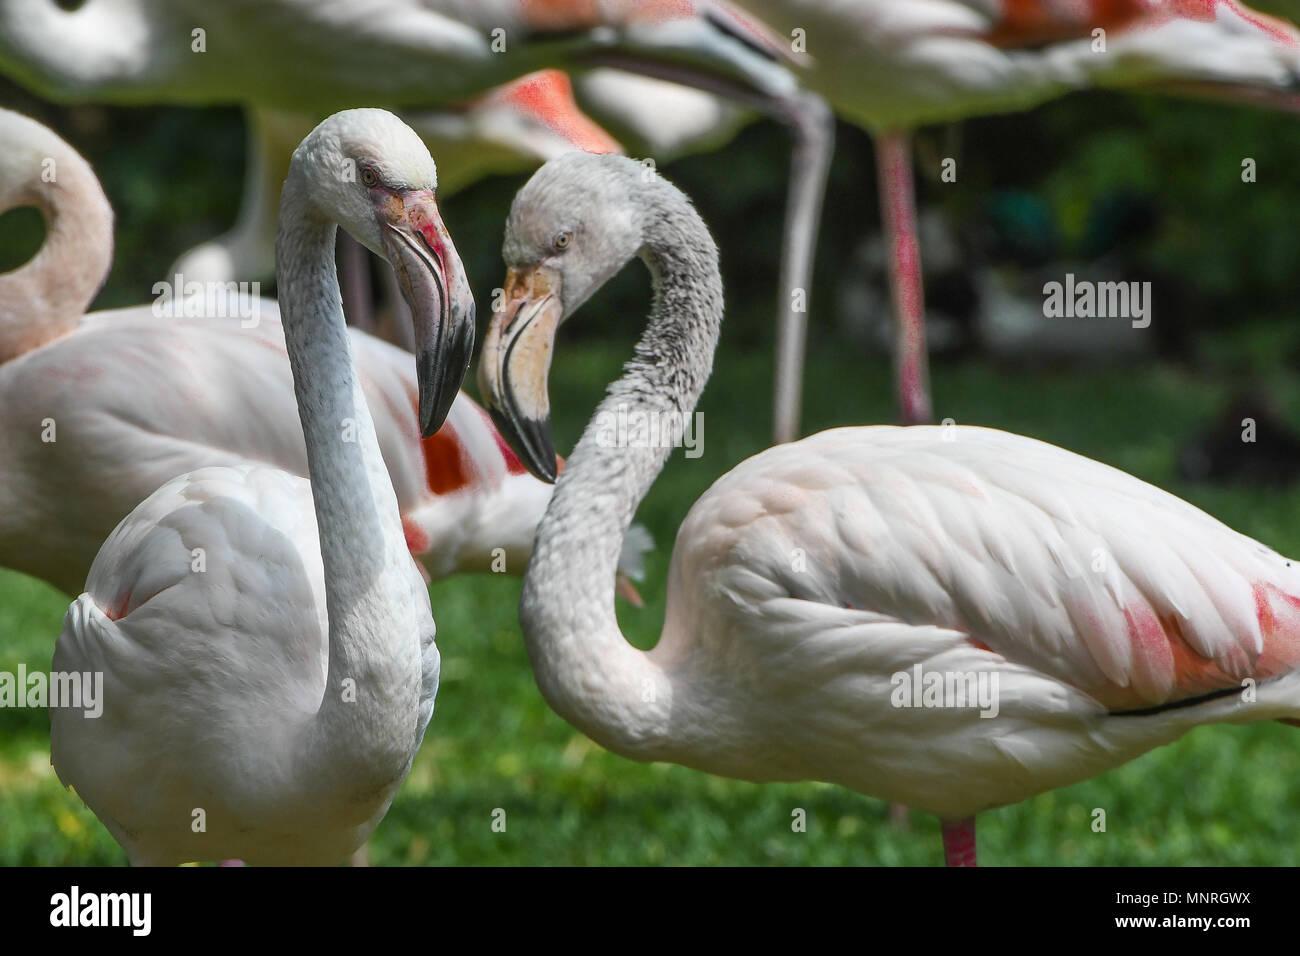 Rosa Flamingo,Phoenicopterus roseus,Greater Flamingo,Bird,Vogel,Voegel,Vögel,flamingo family,water,group, - Stock Image